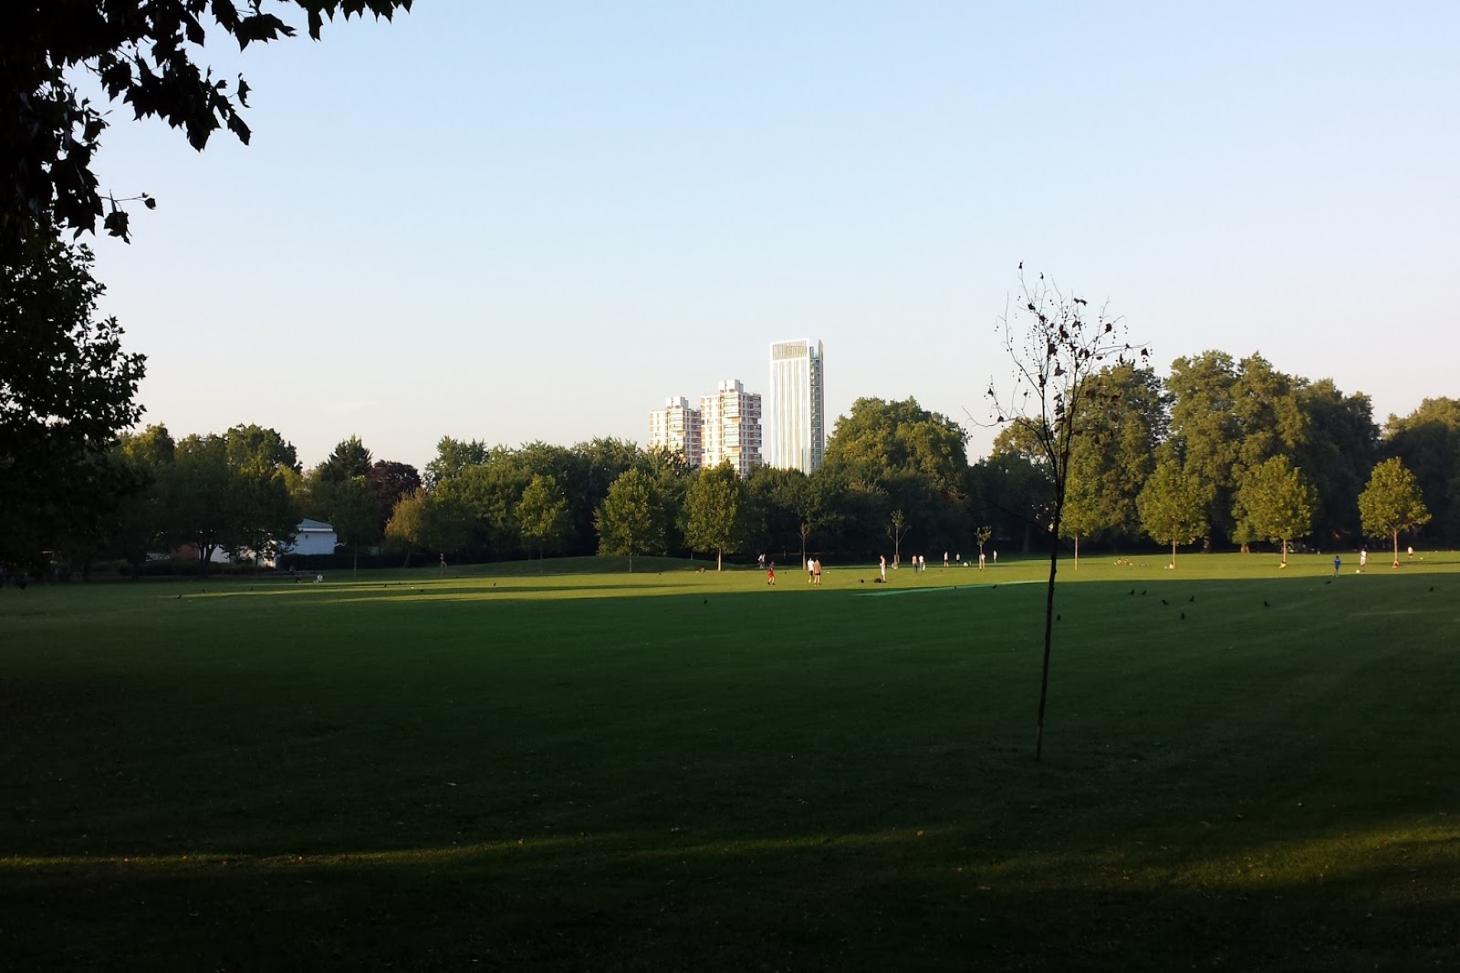 Southwark Park 11 a side   Grass football pitch